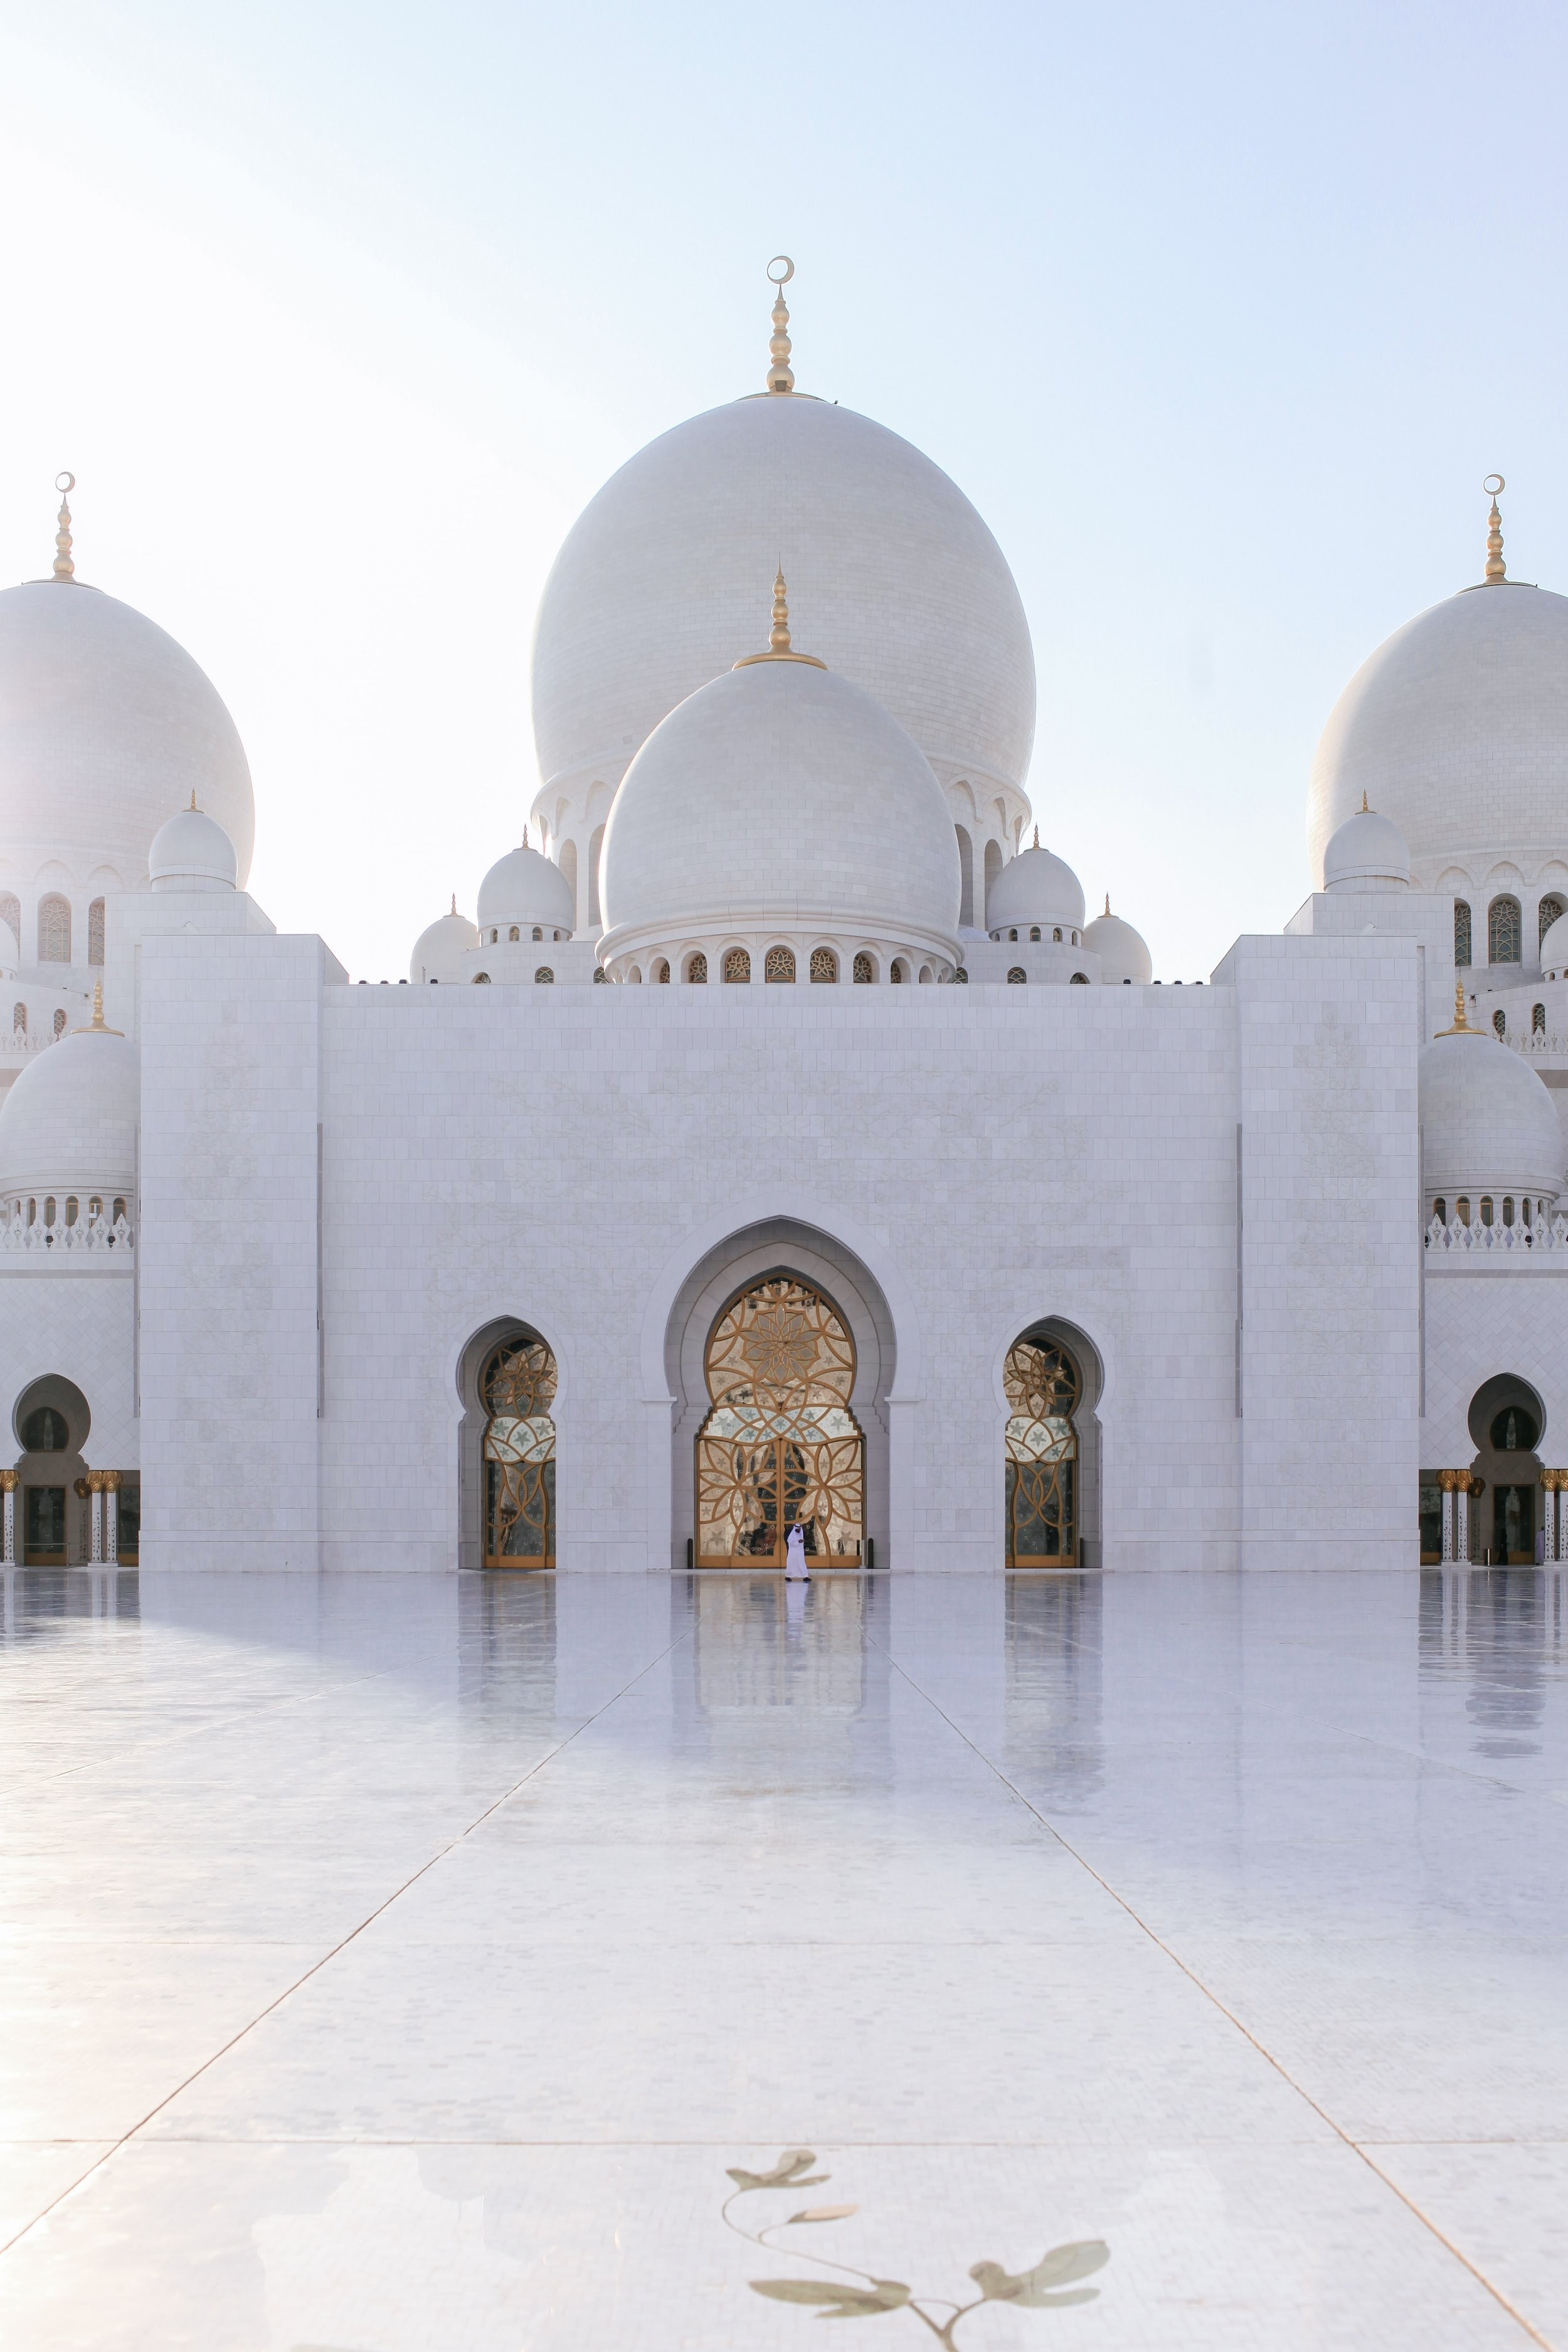 It's Allah's house.jpg